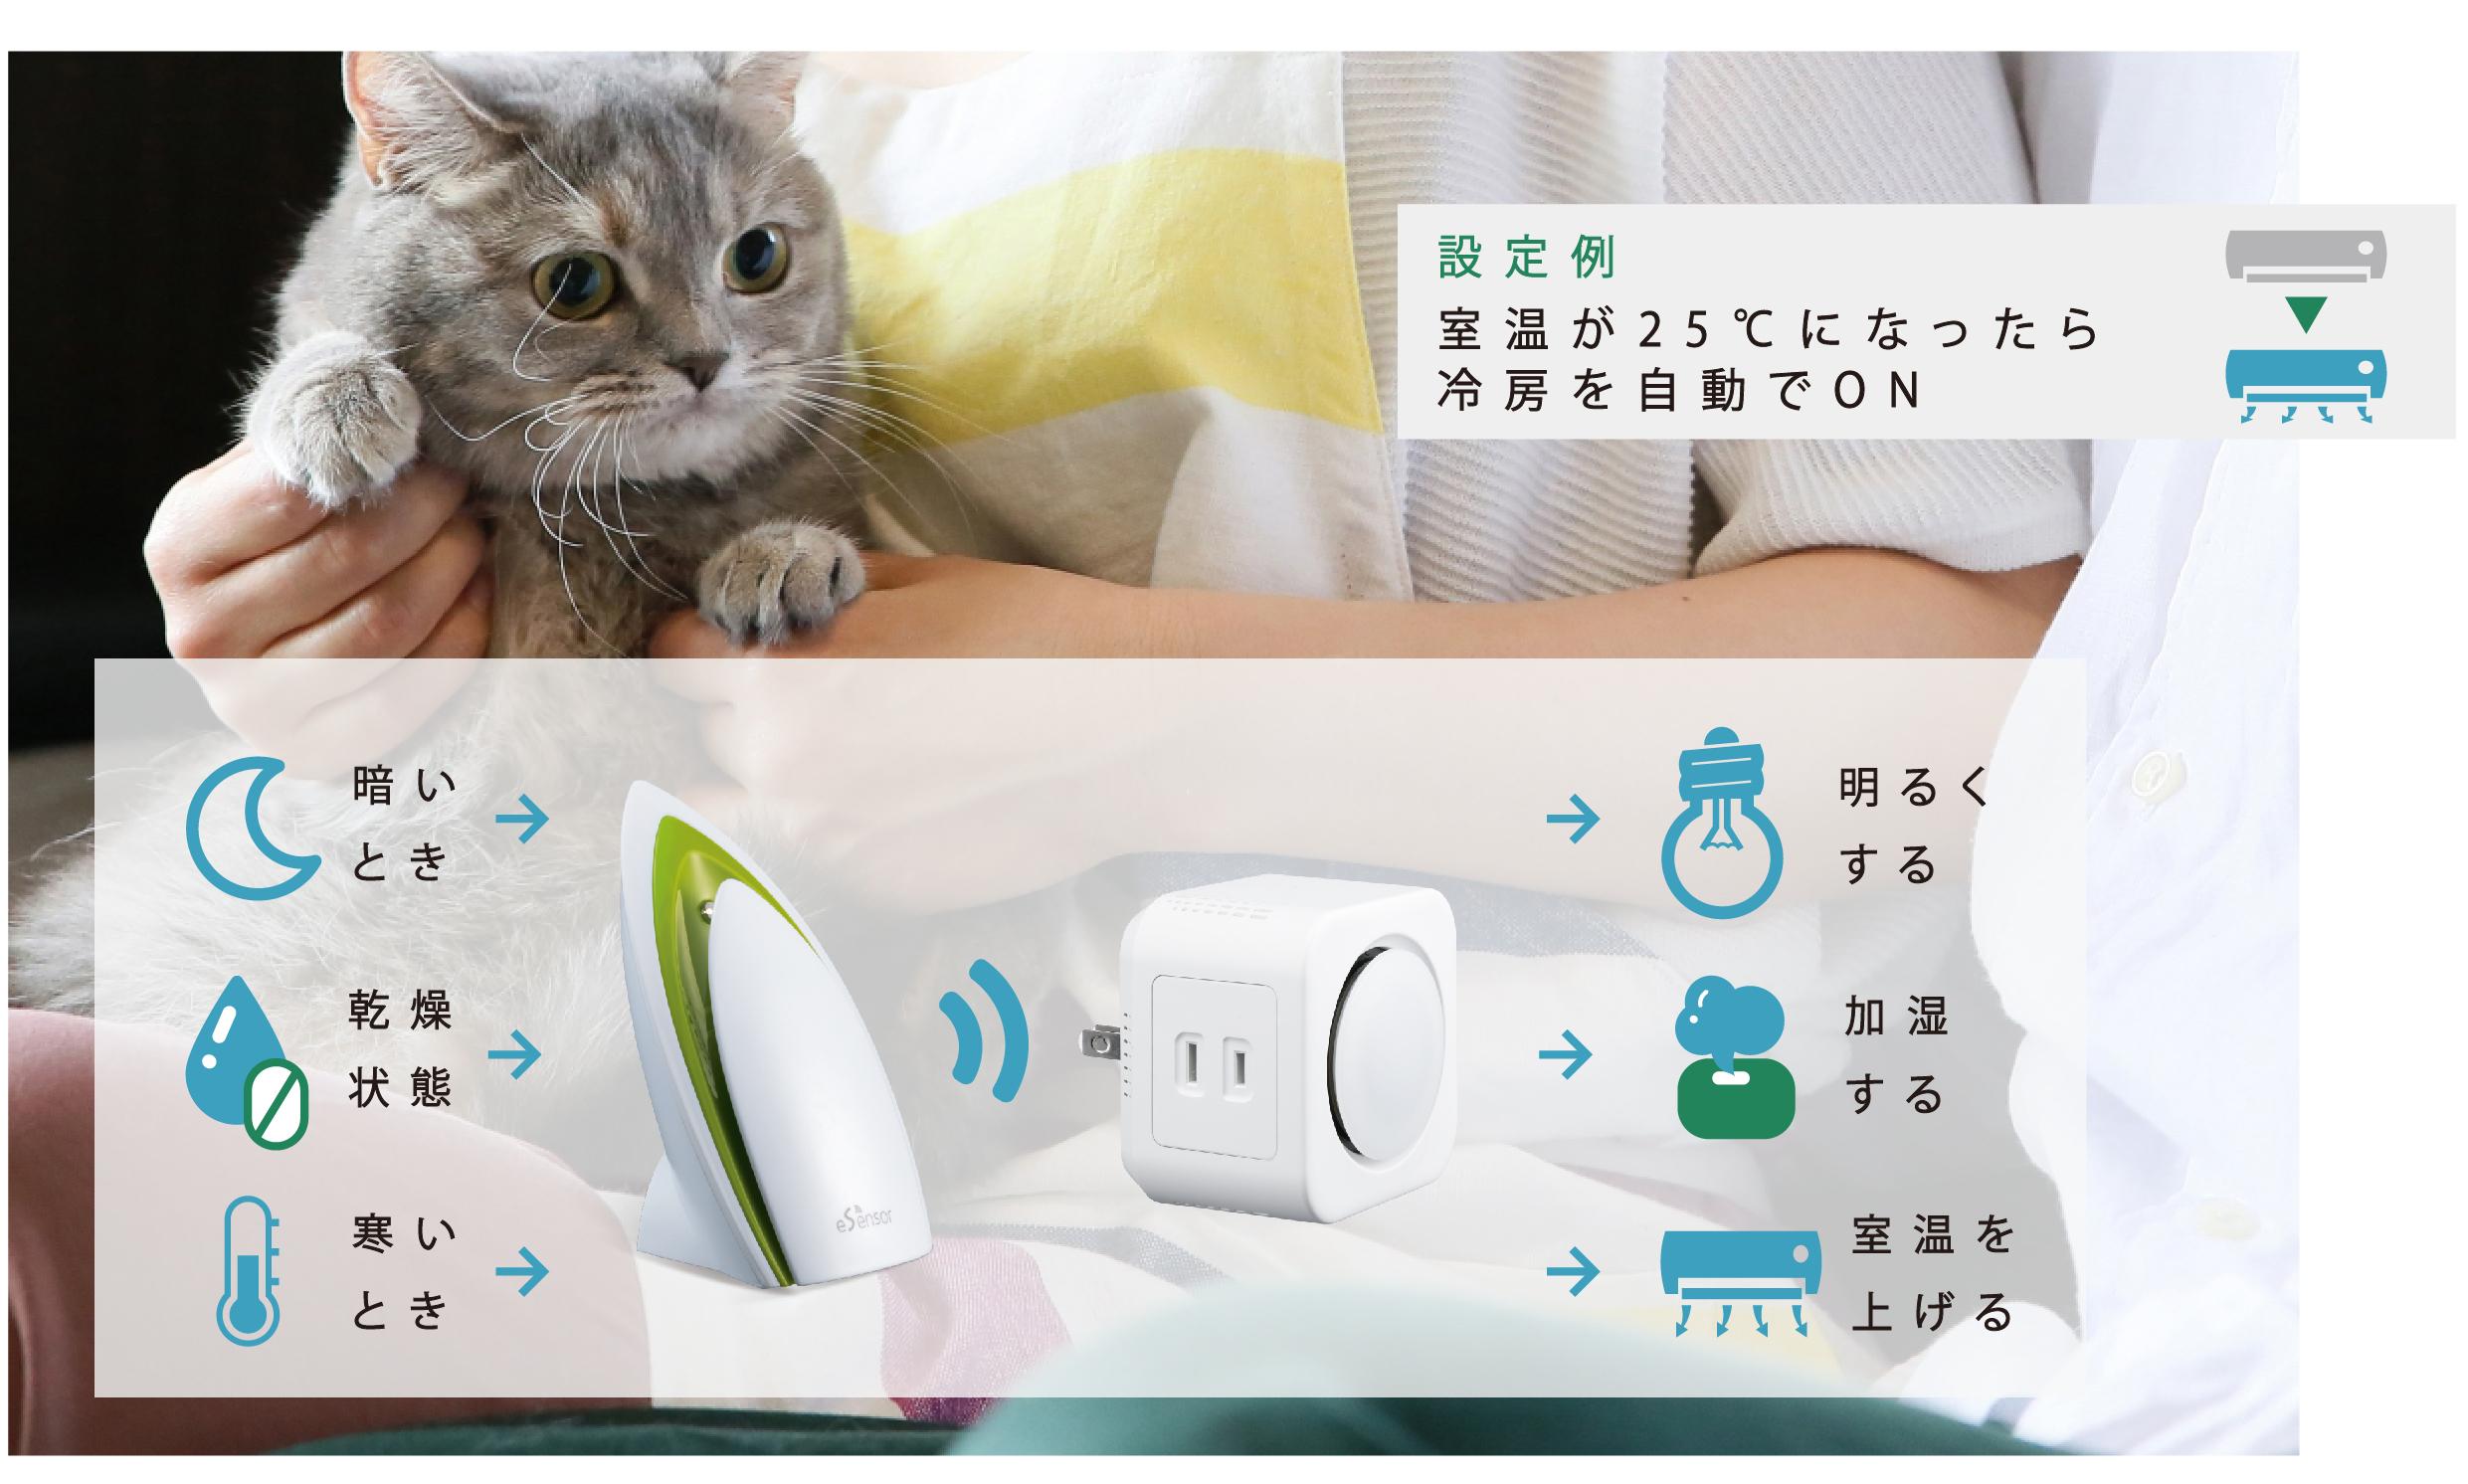 eRemote Pro|IoT 家電 スマートホーム・スマートハウス|Link Japan画像11